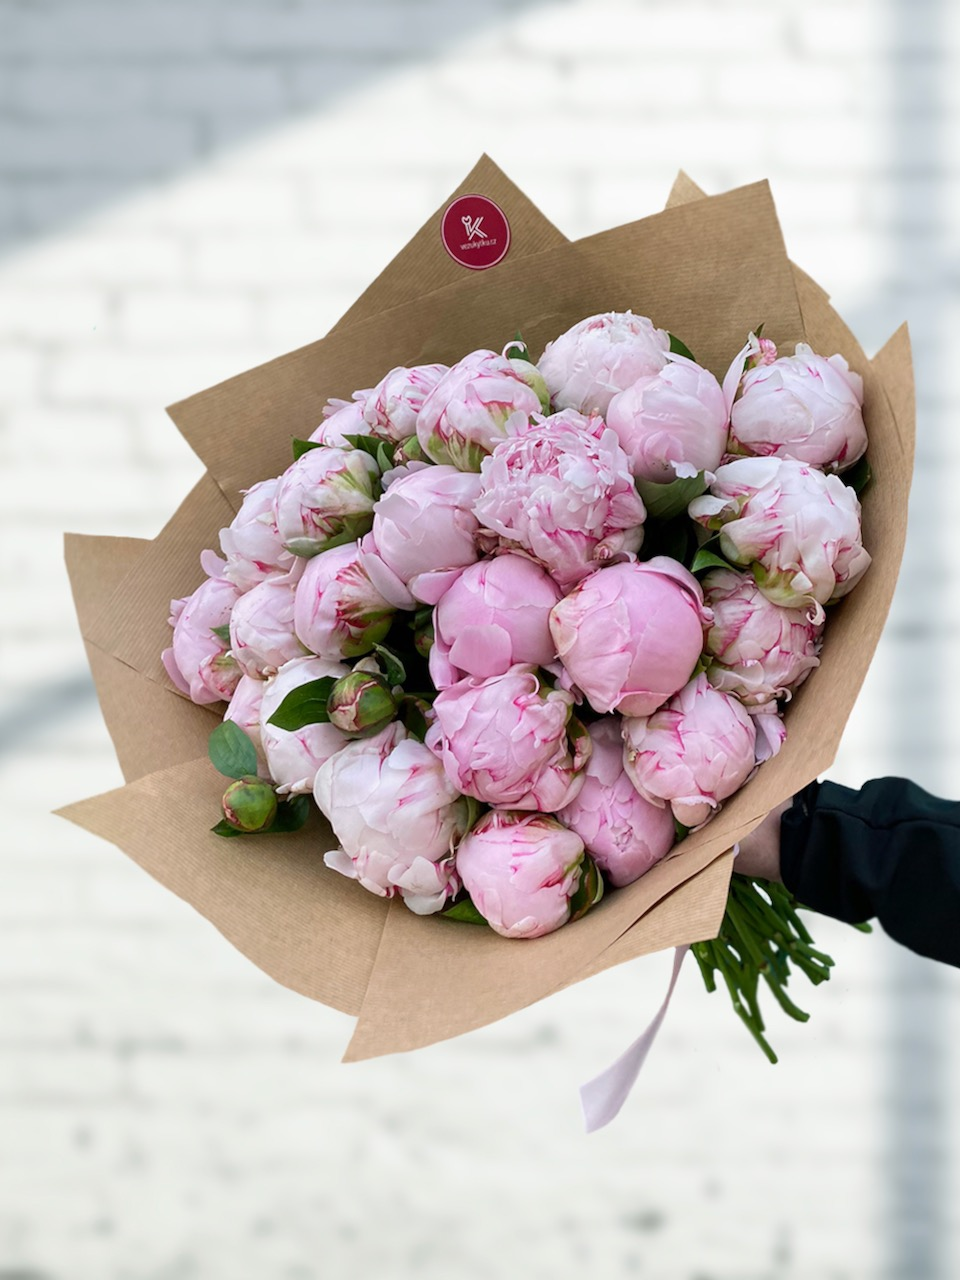 Čerstvá kytice nádherných pivoněkk